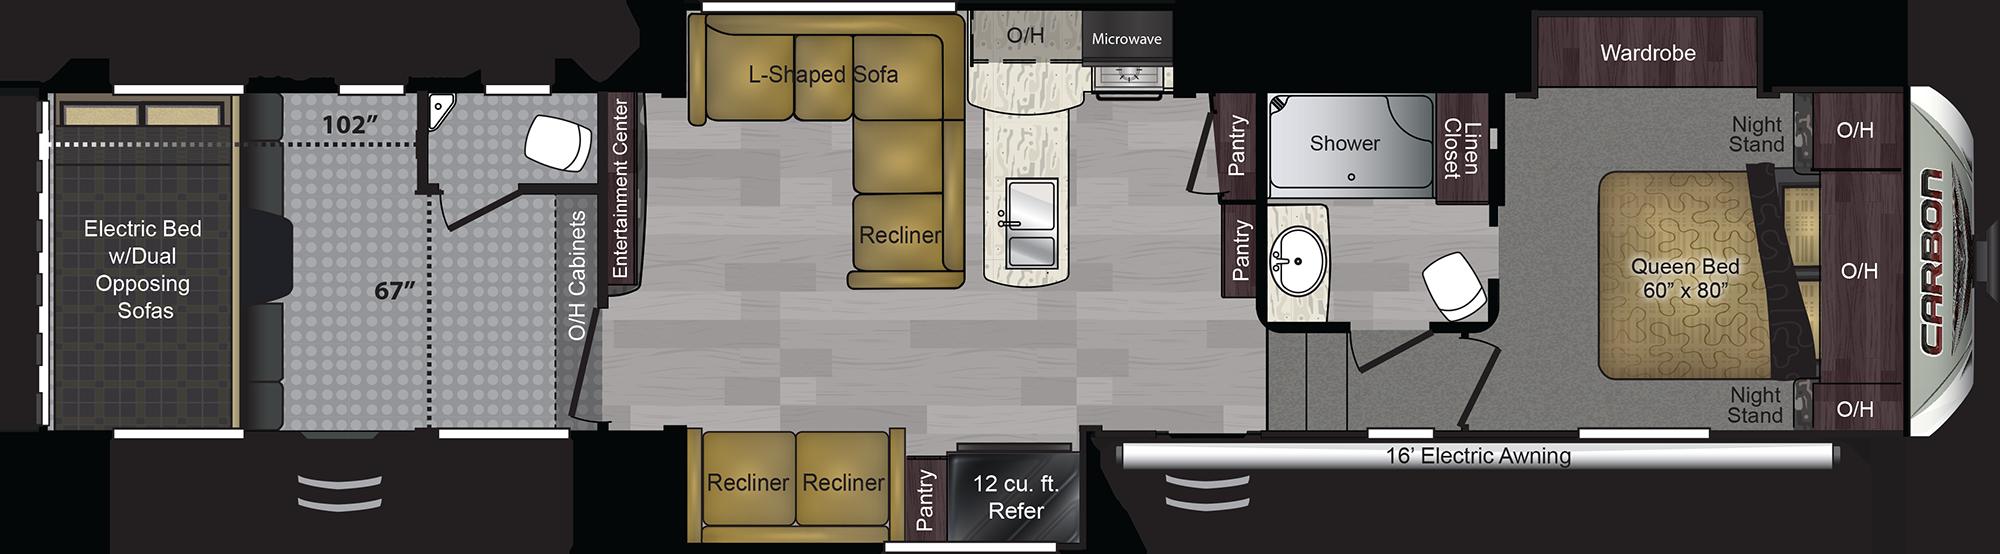 403 Floorplan